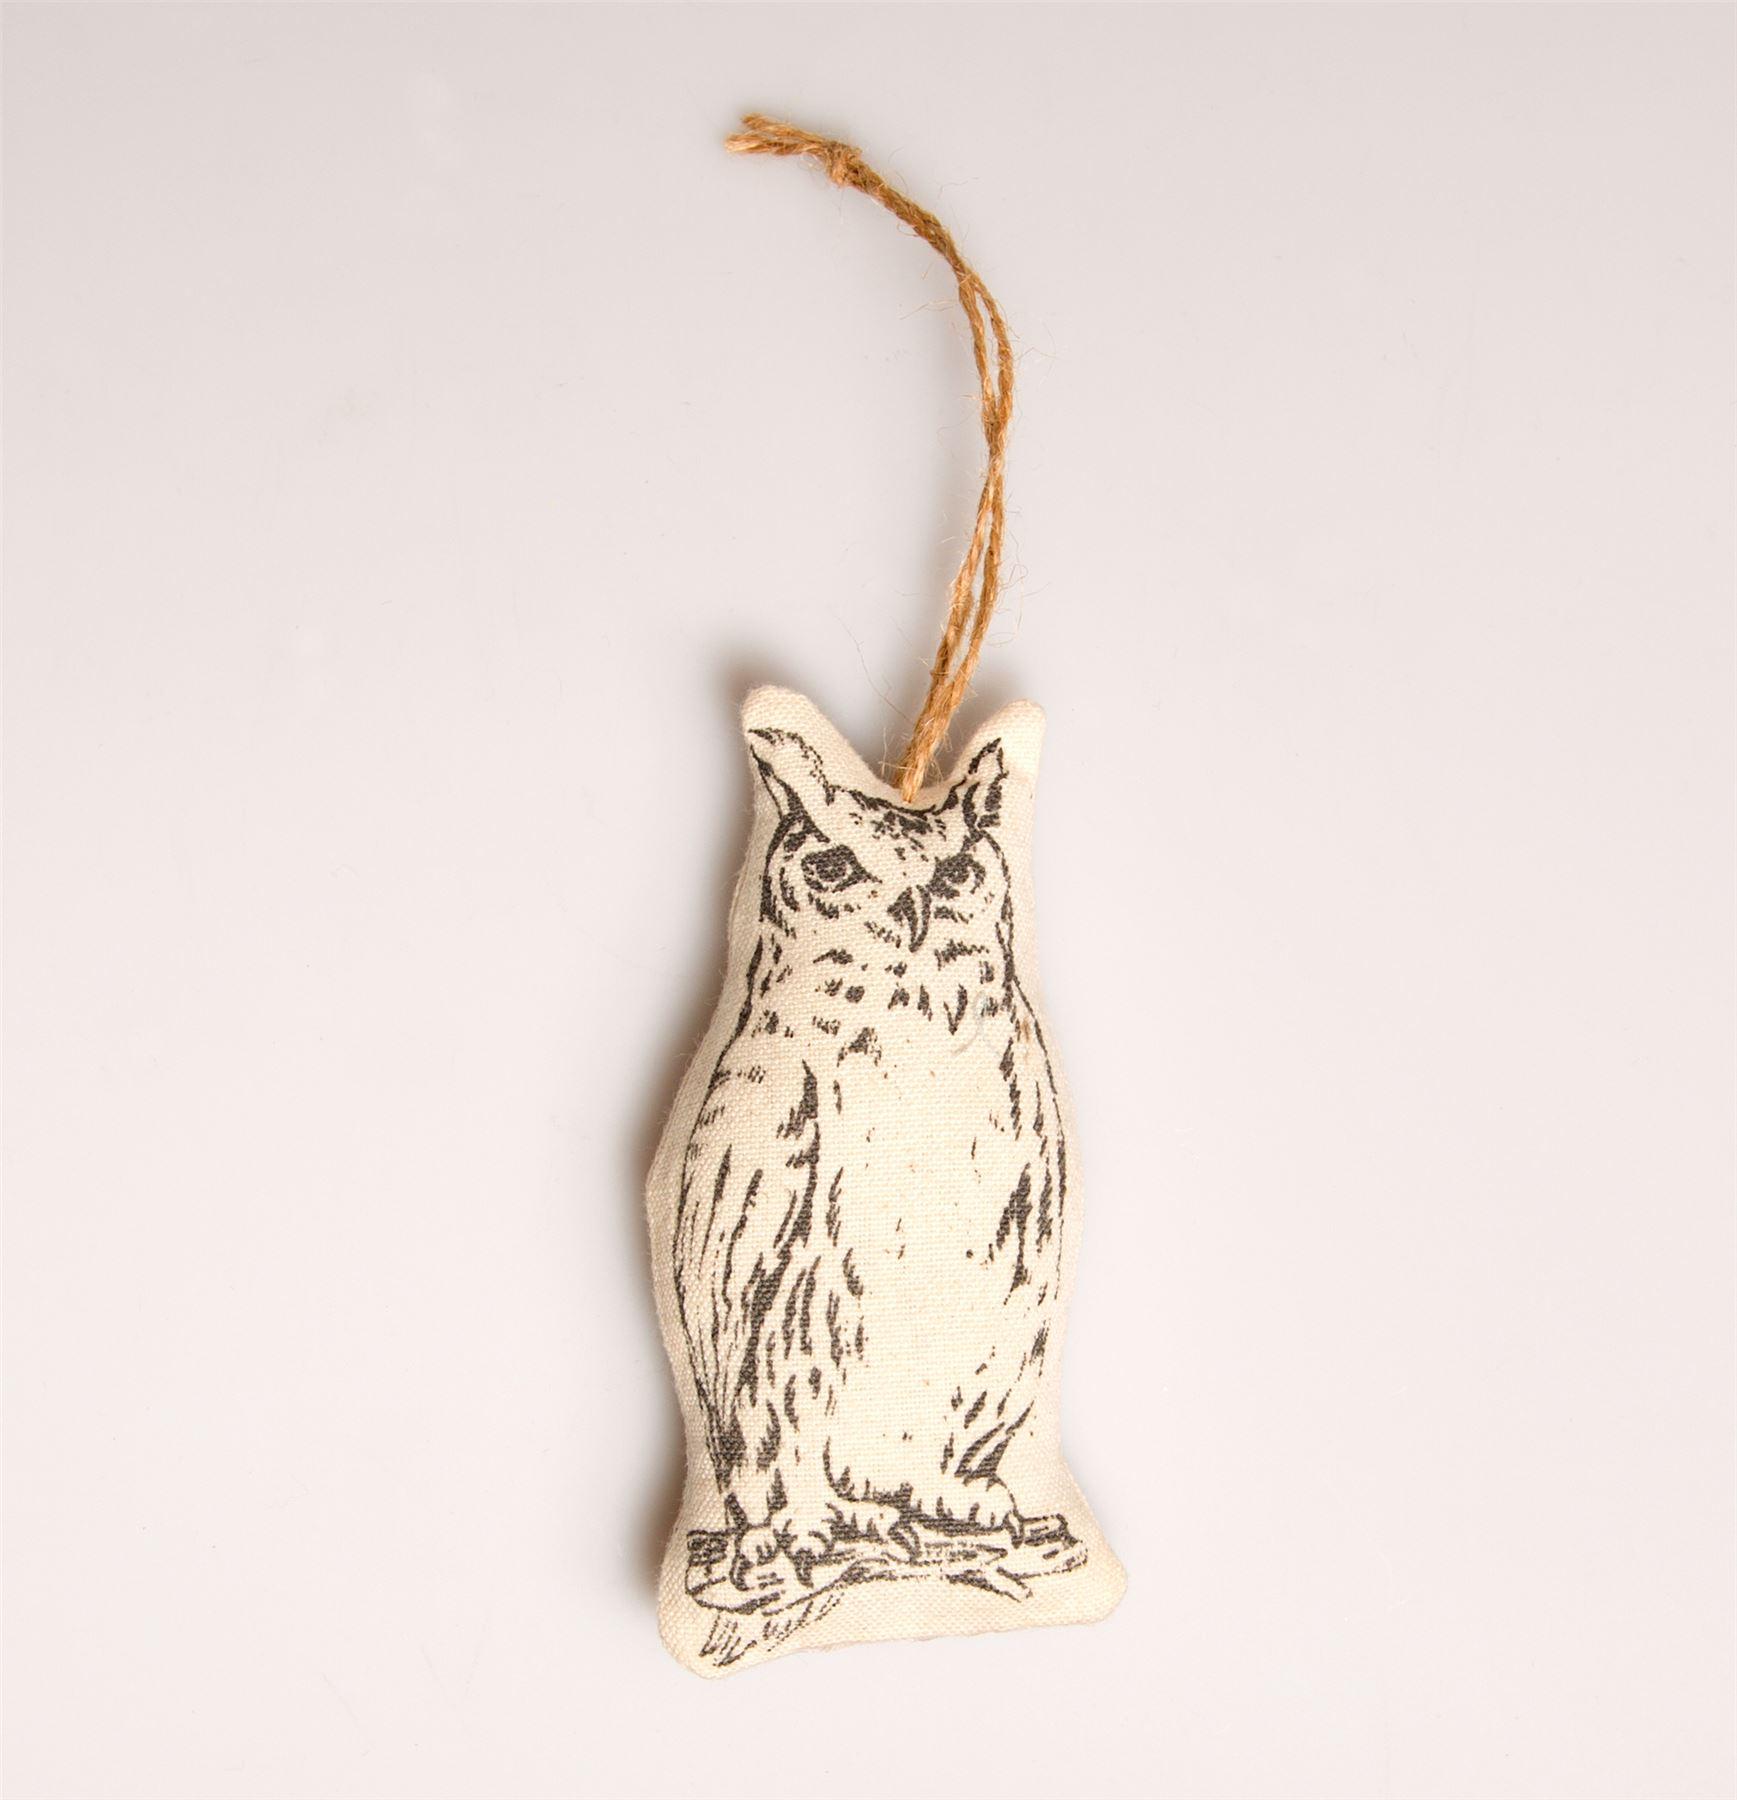 tissu no l hibou cerf deer suspendu d corations pour. Black Bedroom Furniture Sets. Home Design Ideas